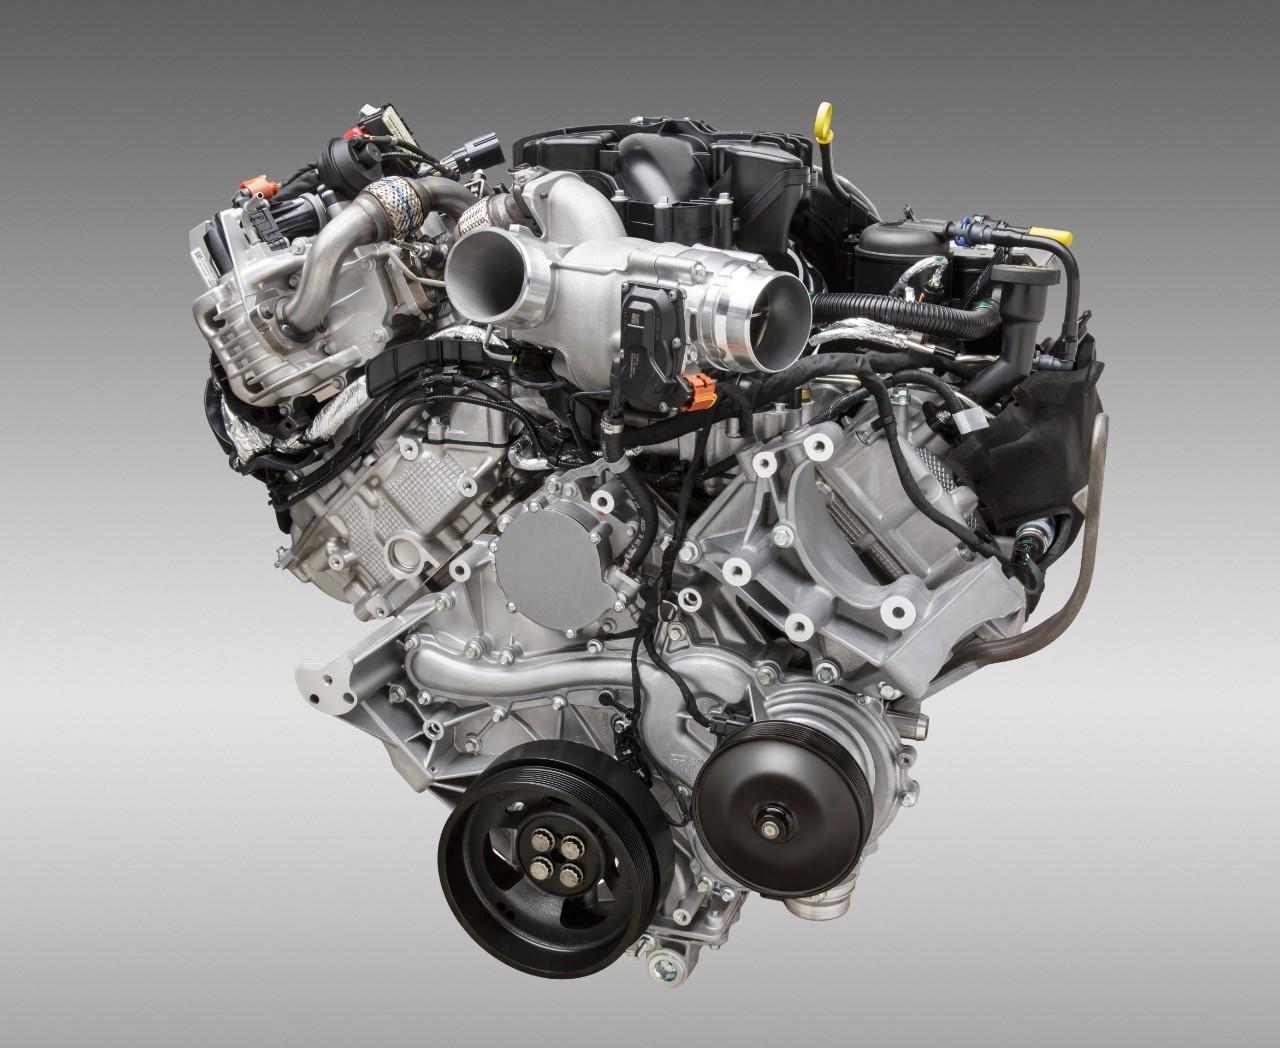 2016 ford f 650 f 750 super duty 6 7 power stroke turbo diesel